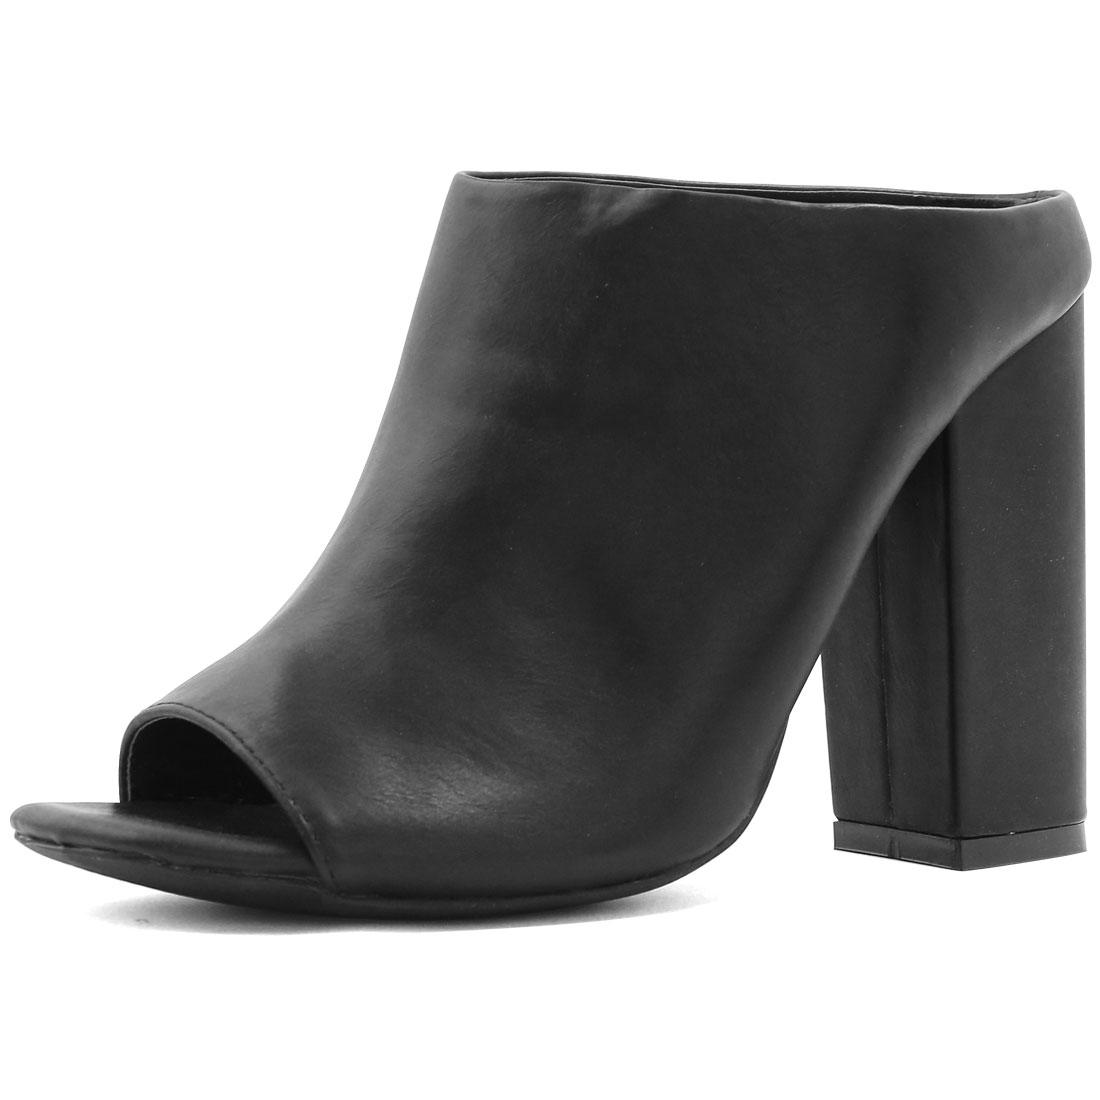 Woman Square Peep Toe Slip On Chunky High Heel Mules Black US 7.5